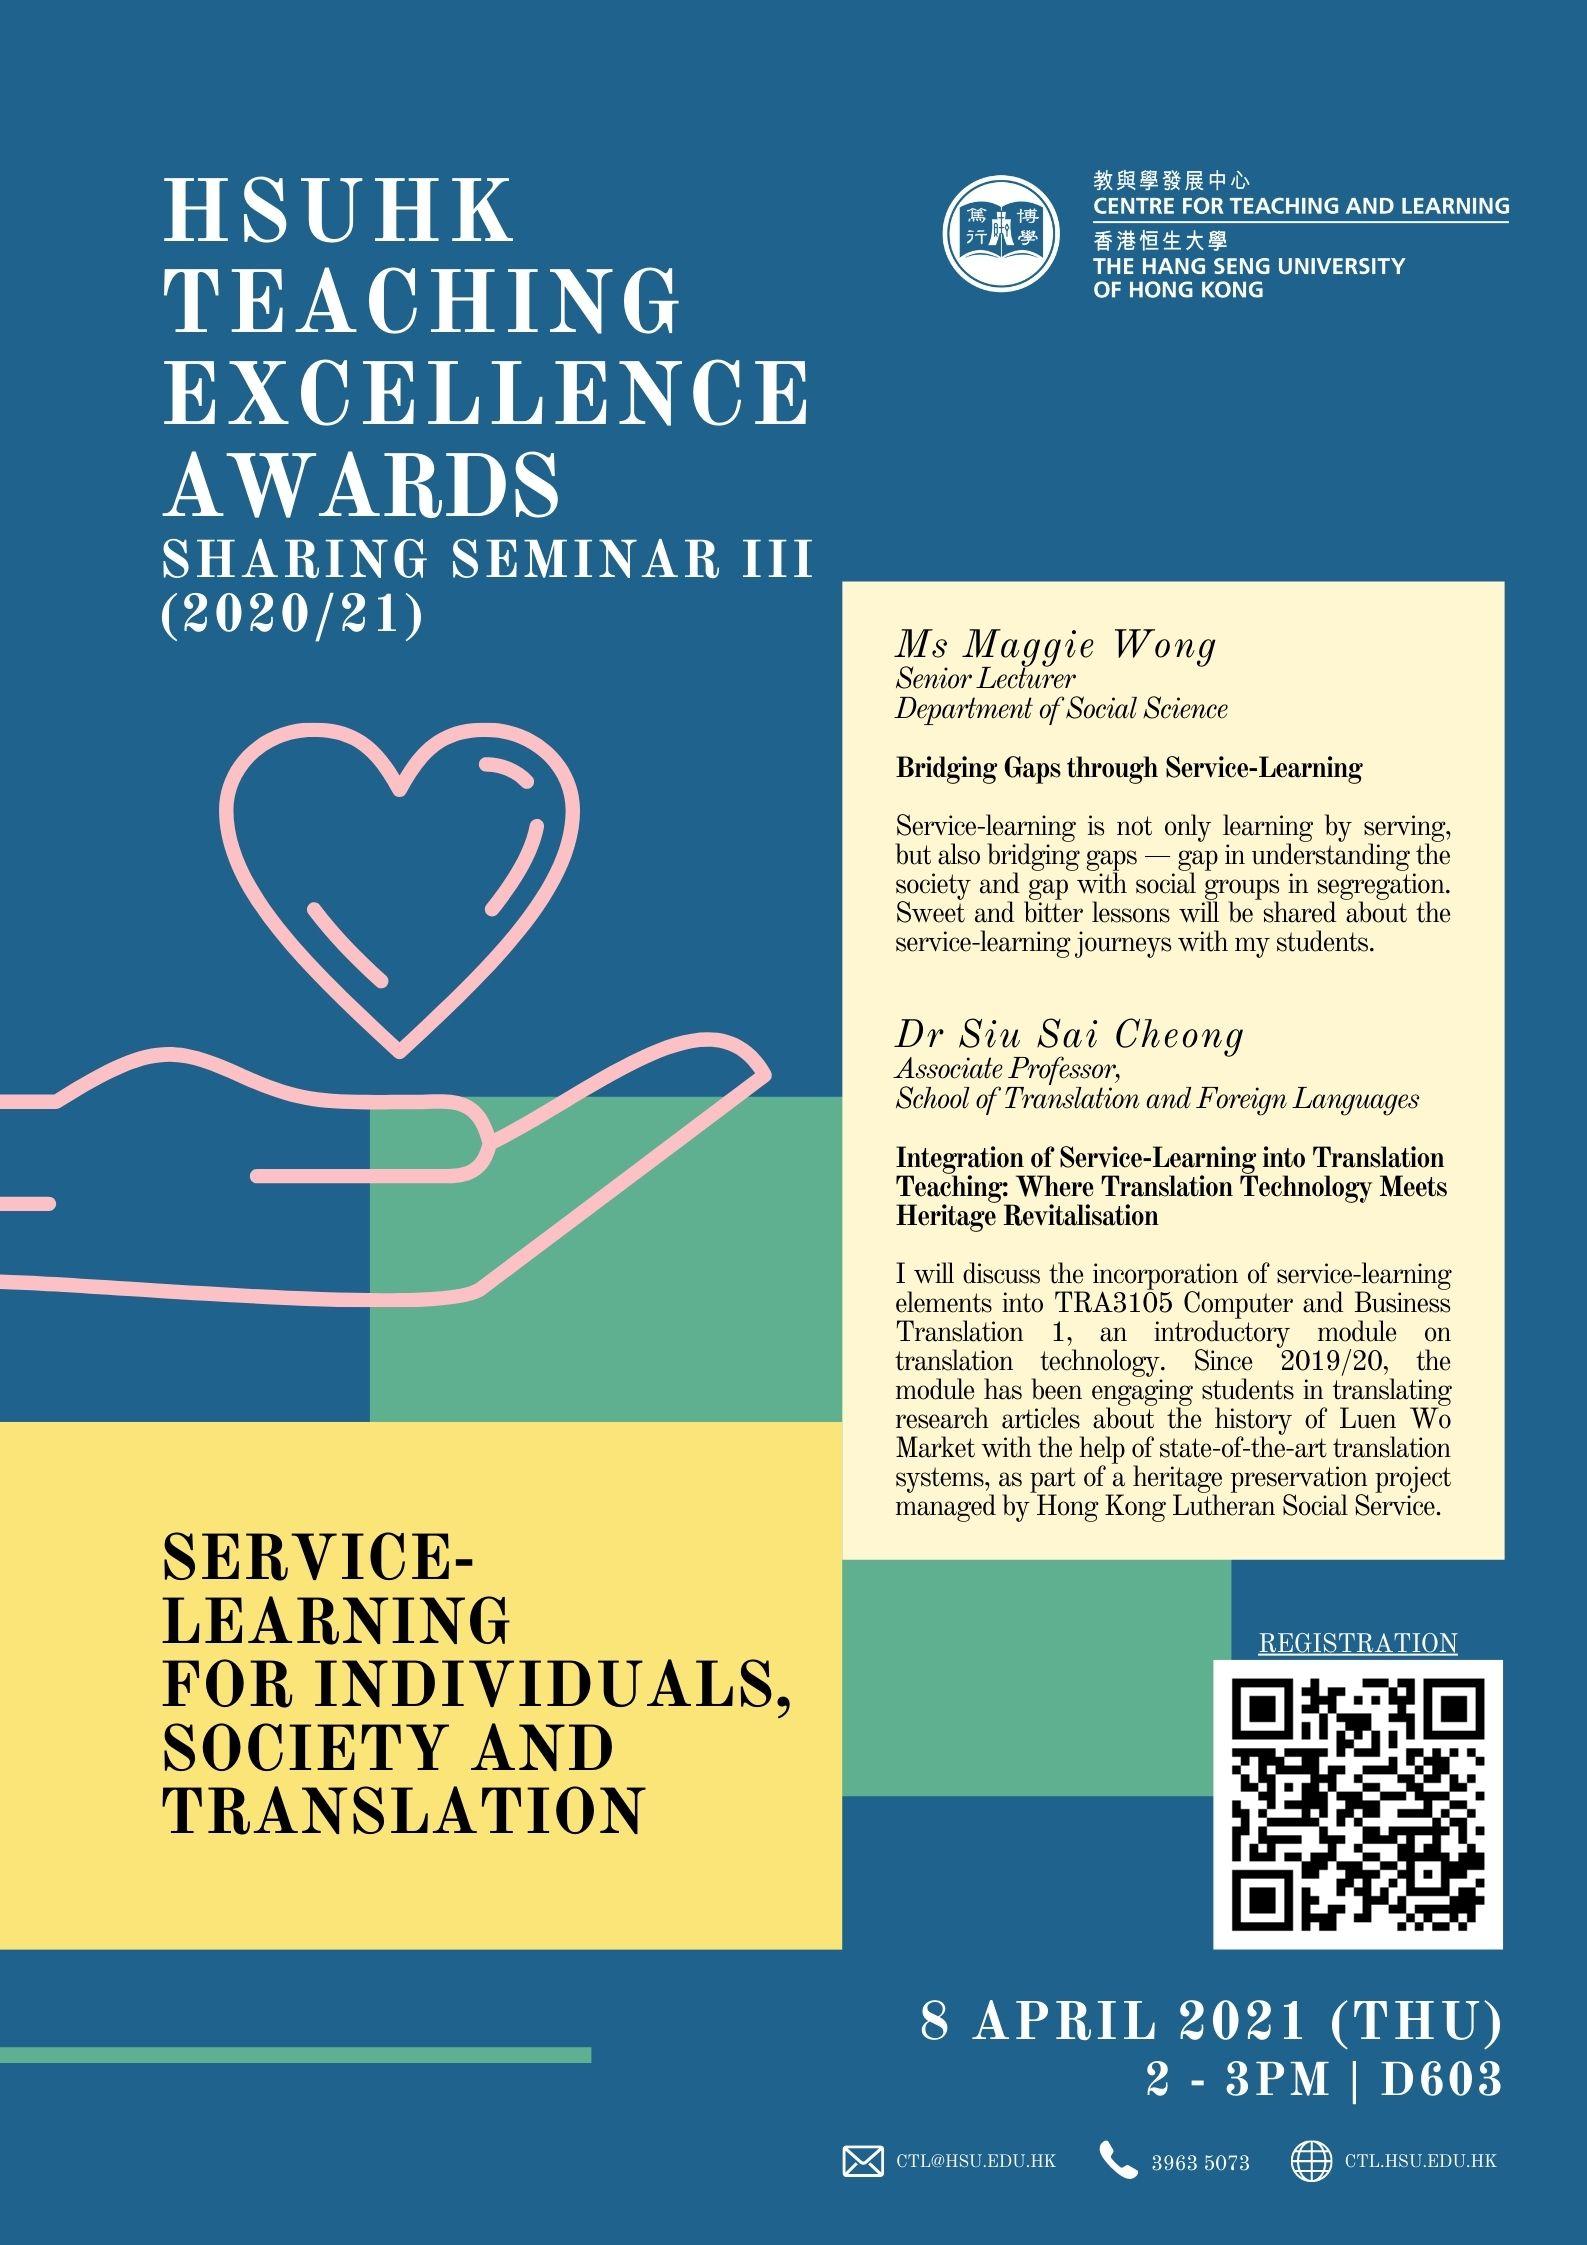 HSUHK Teaching Excellence Awards Sharing Seminar III (2020/21) Poster